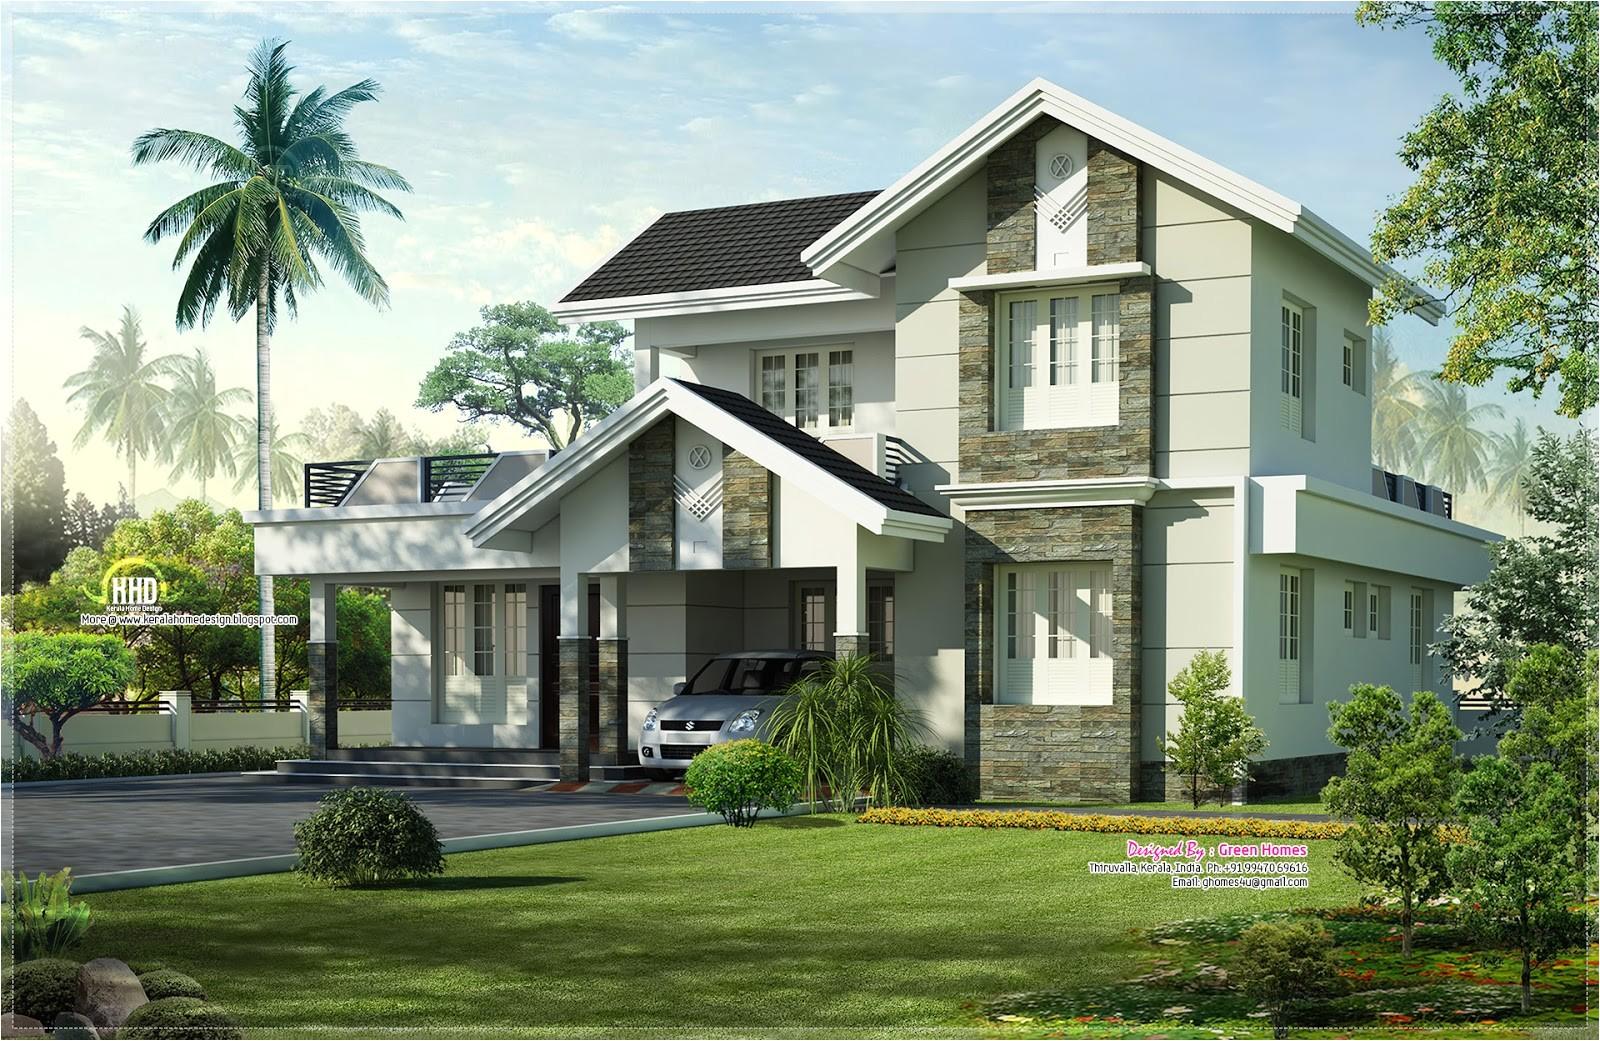 most beautiful houses in kerala beautiful house designs kerala beautiful house design in the world beautiful design houses photos